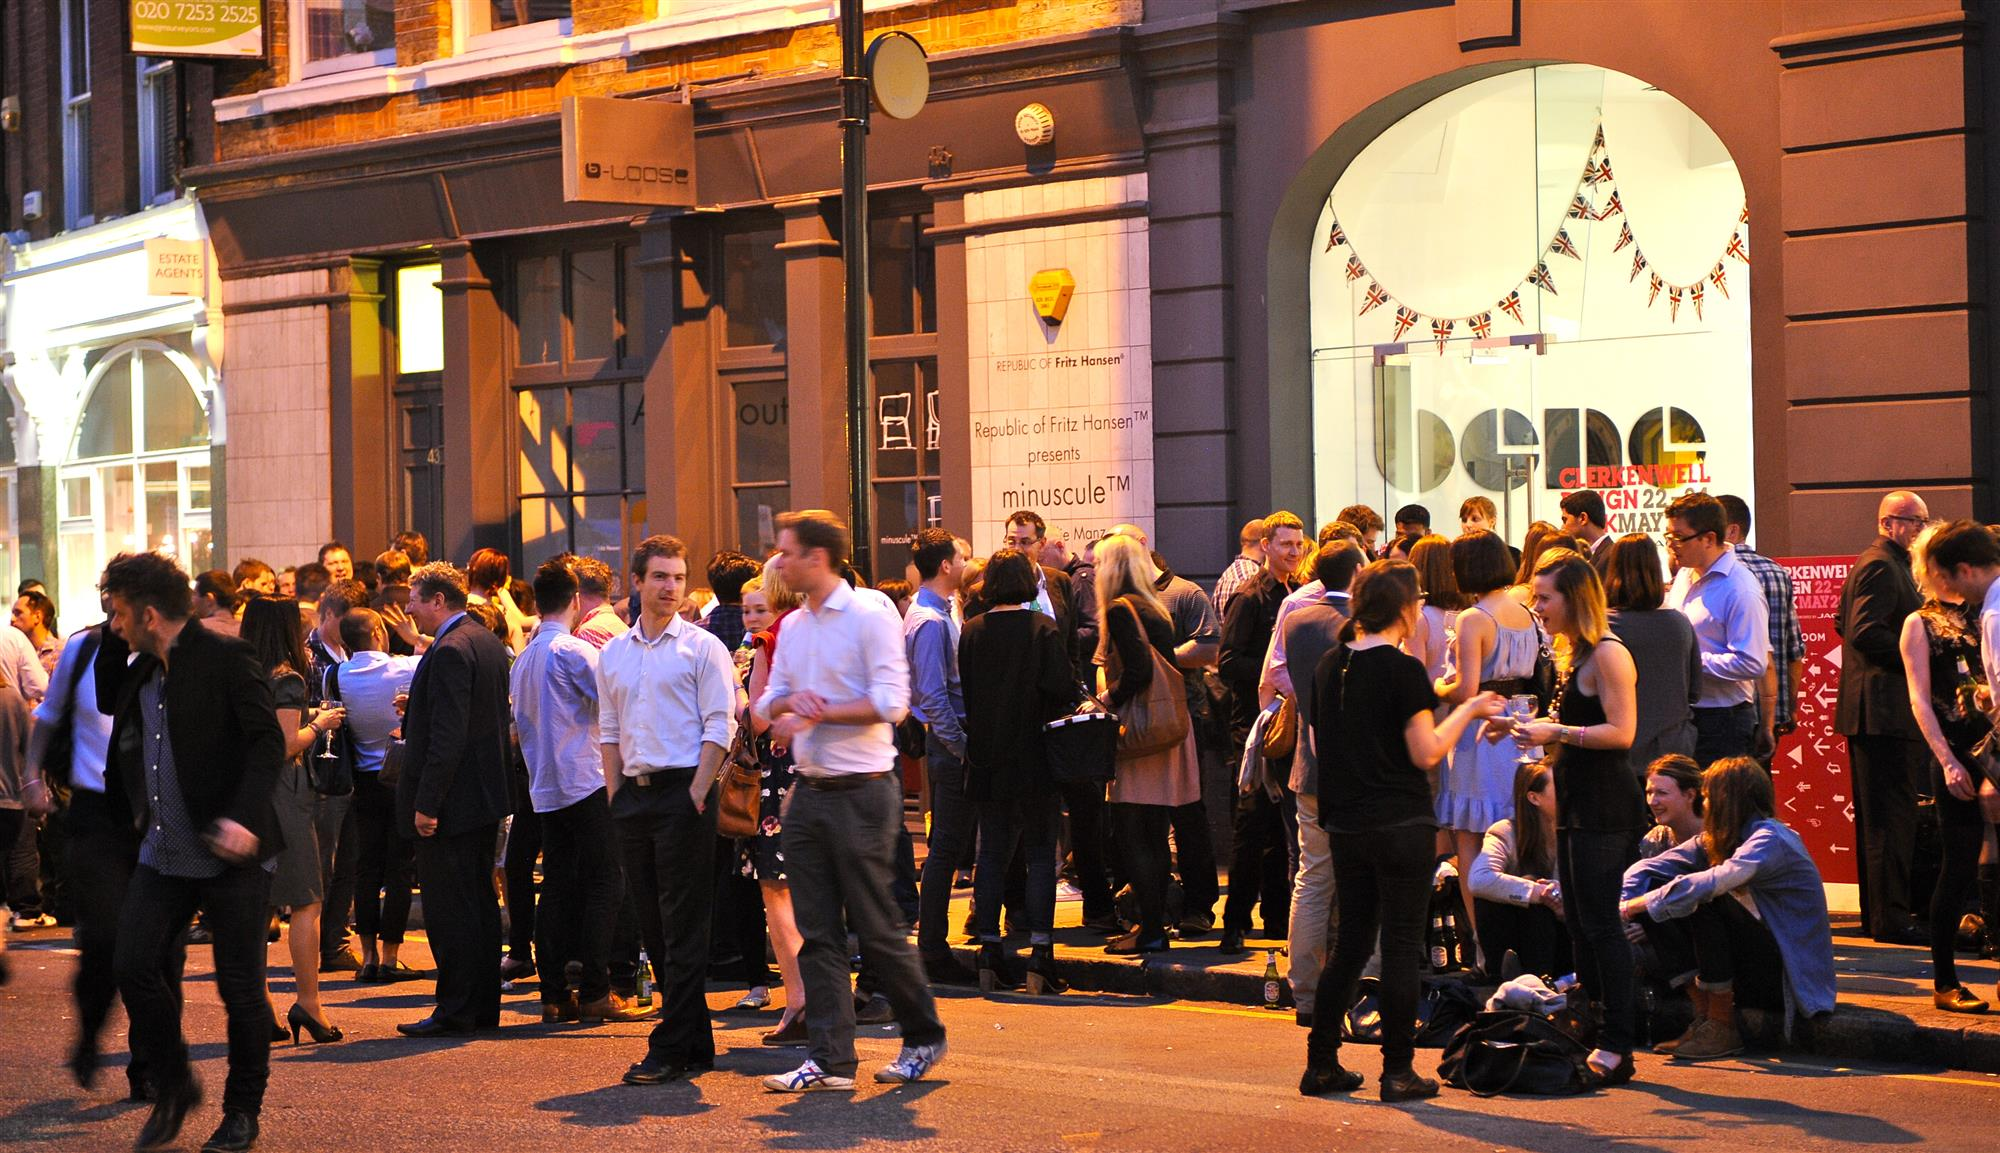 Es la gran fiesta del barrio de Clerkenwell.